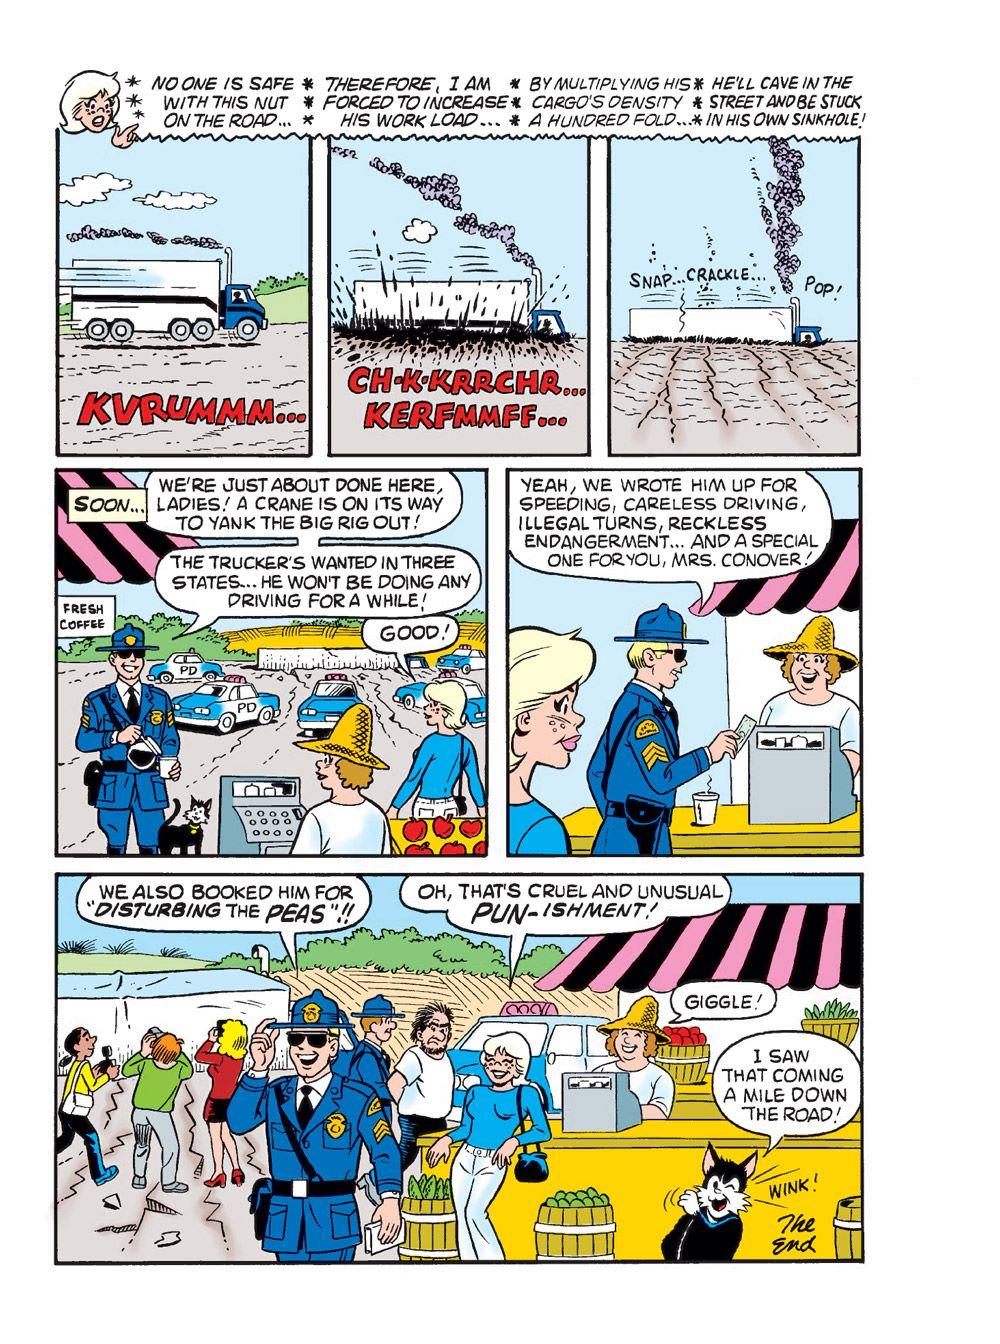 BettyAndVeronicaJumboComicsDigest_293-52 ComicList Previews: BETTY AND VERONICA JUMBO COMICS DIGEST #293